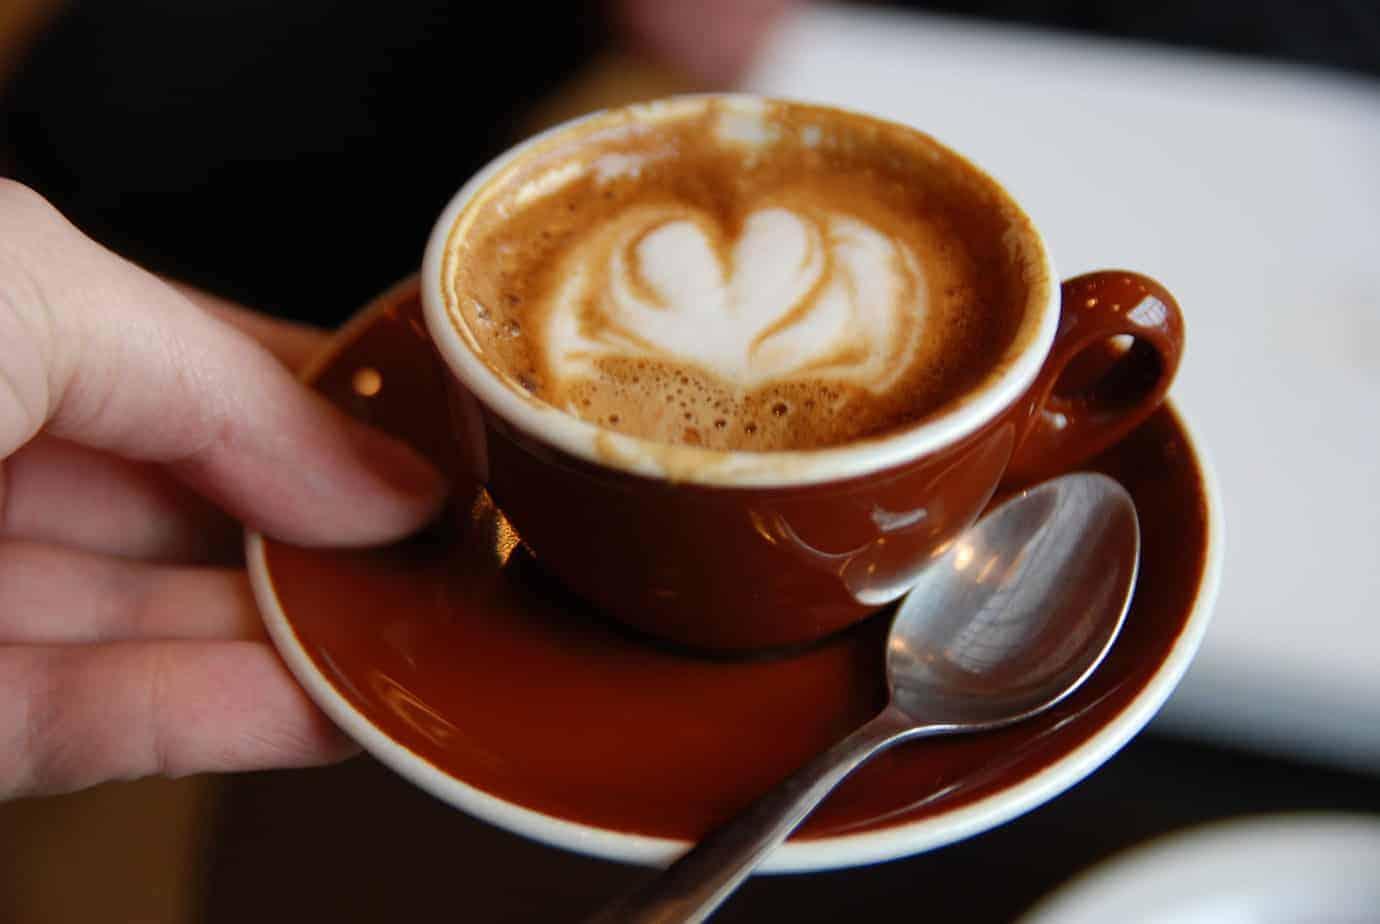 A macchiato from Stumptown Coffee Roasters